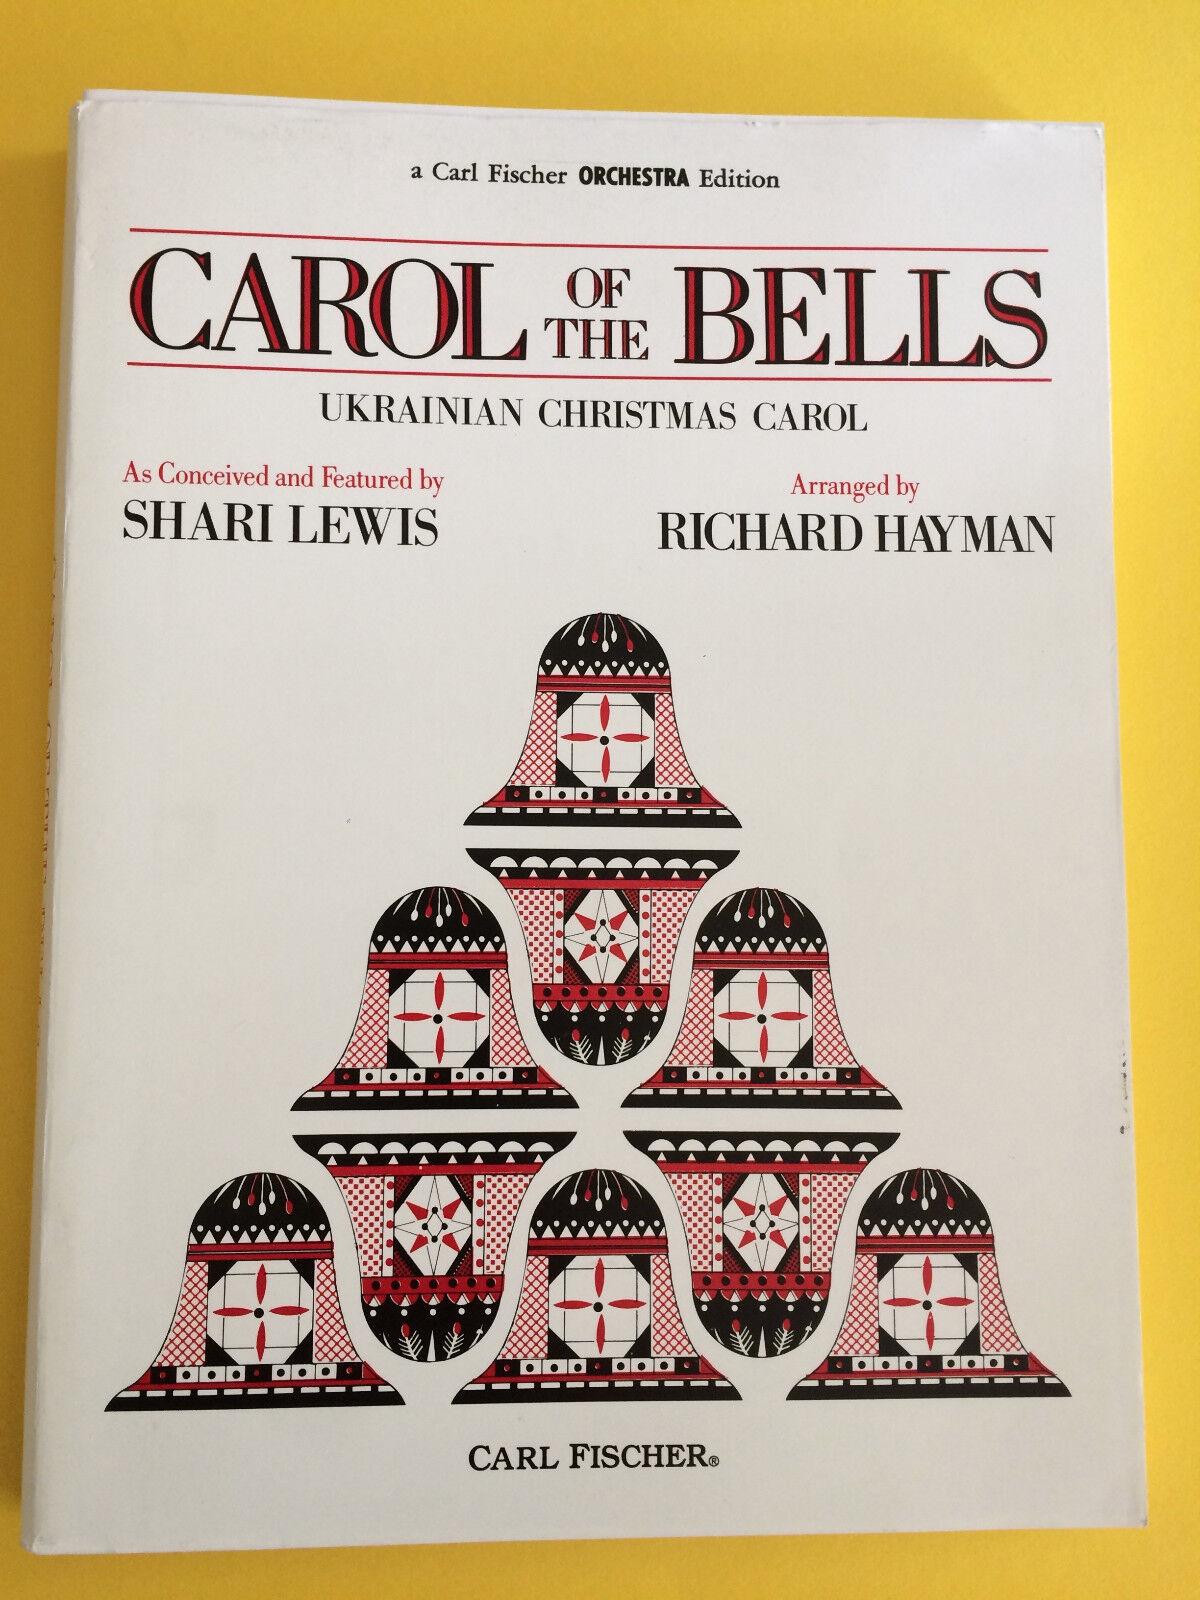 Carol Of The Bells, arr. Richard Hayman, Full Orchestra